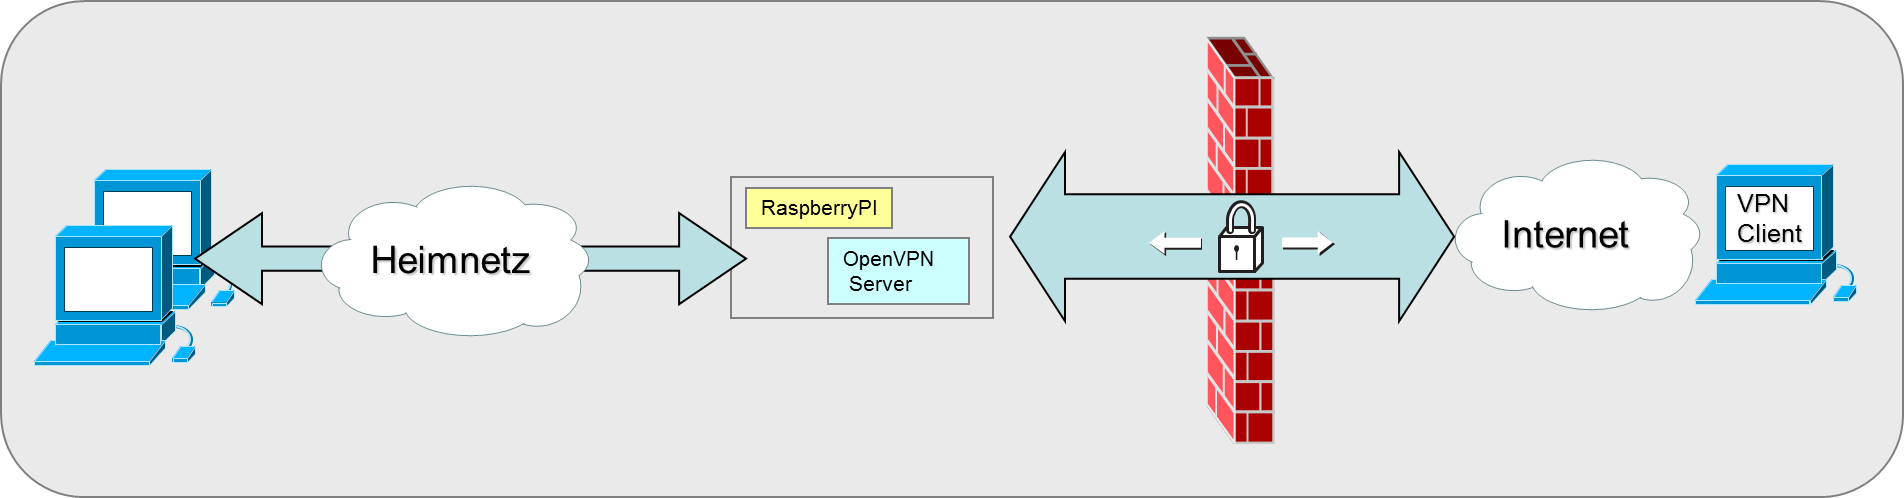 Raspberry PI VPN Server - IT-Technet Blog